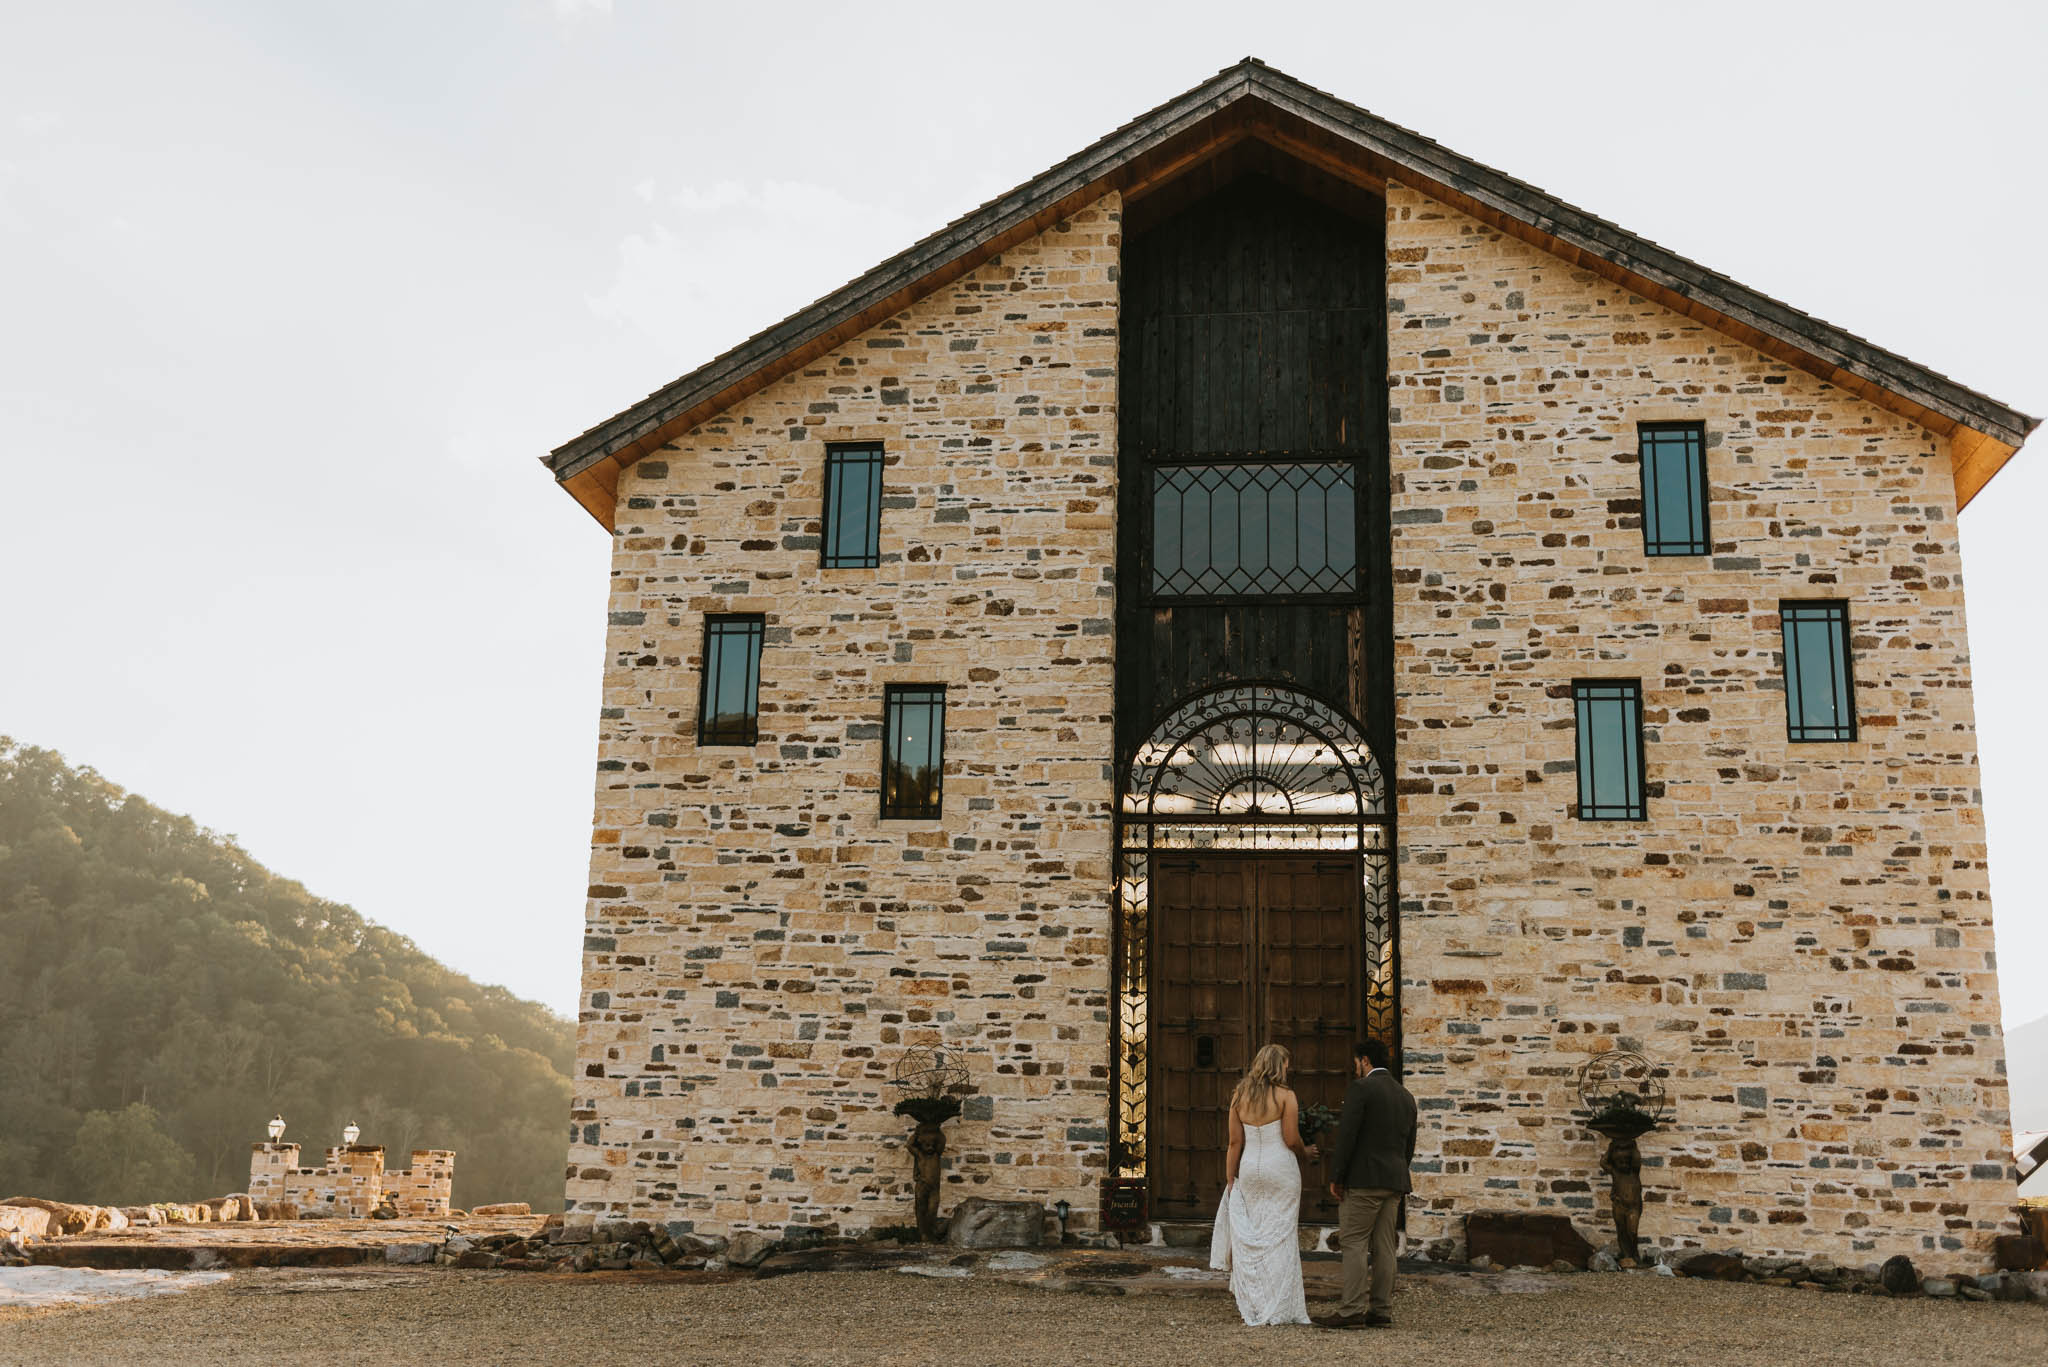 Crooked River Farm, Hiltons, VA, East Tennessee Wedding Photographer, Northeast Tennessee Wedding Photographer, Knoxville, TN Wedding Photographer